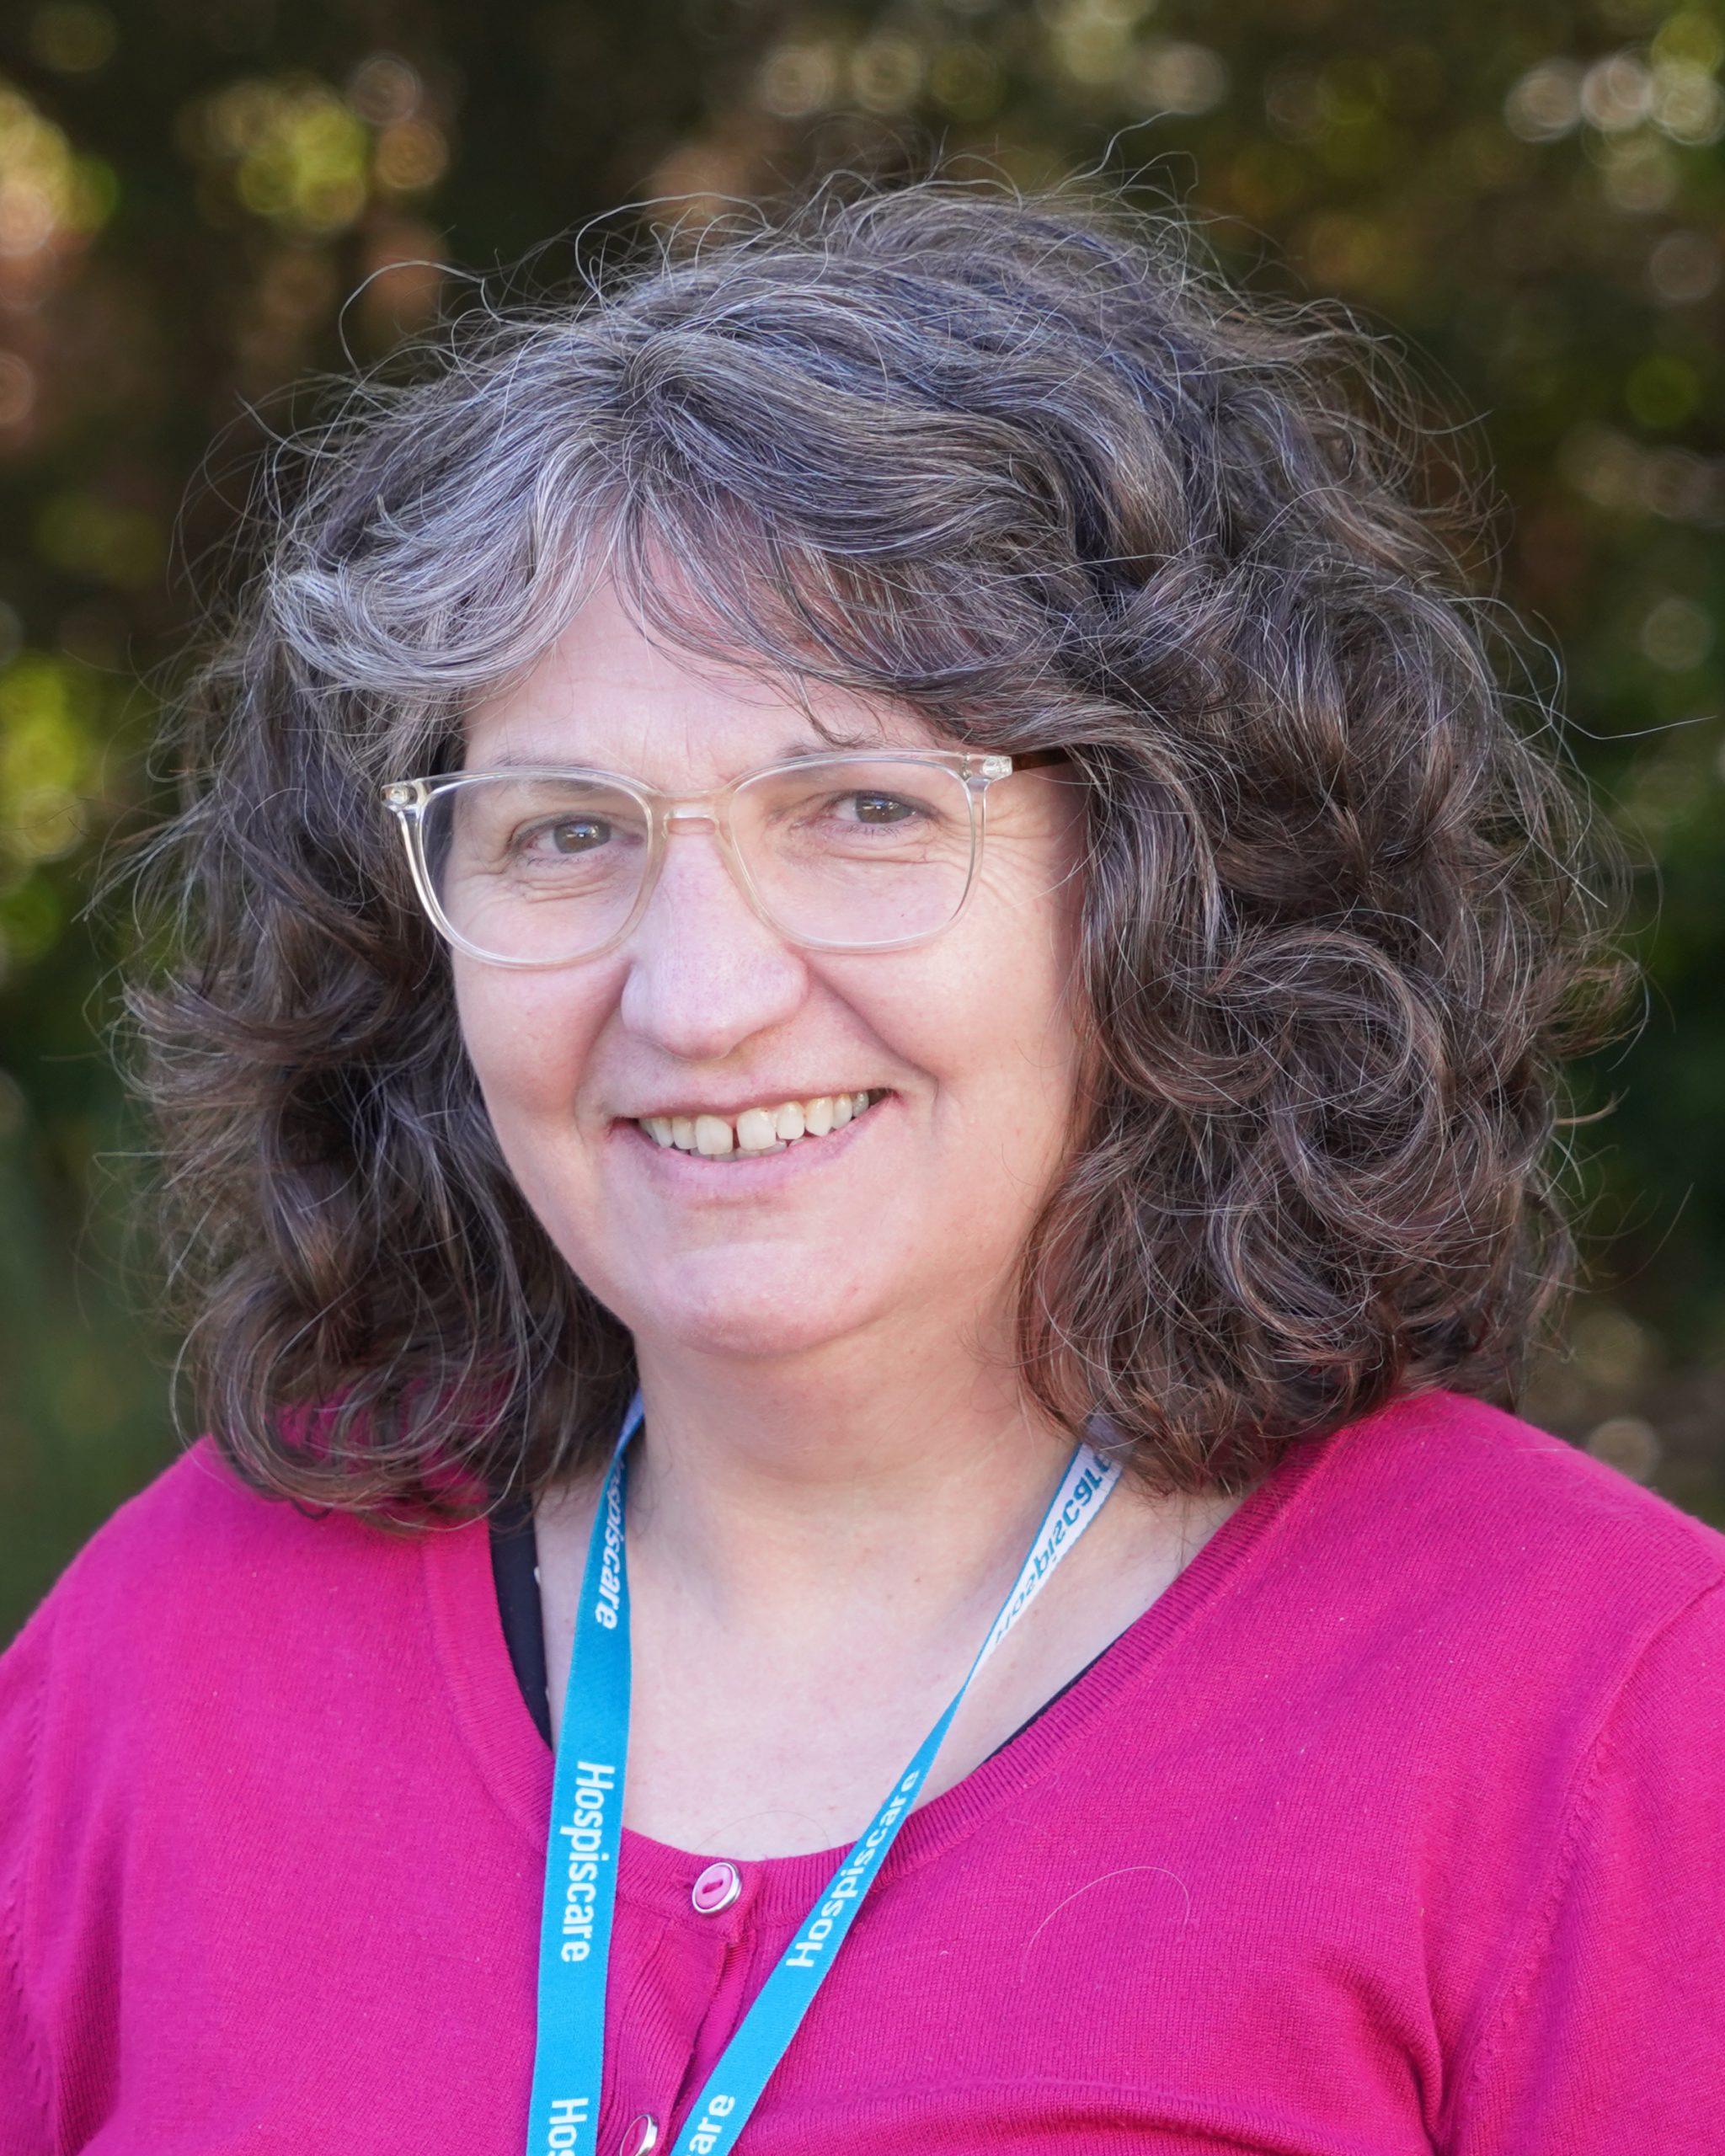 Tina Naldrett